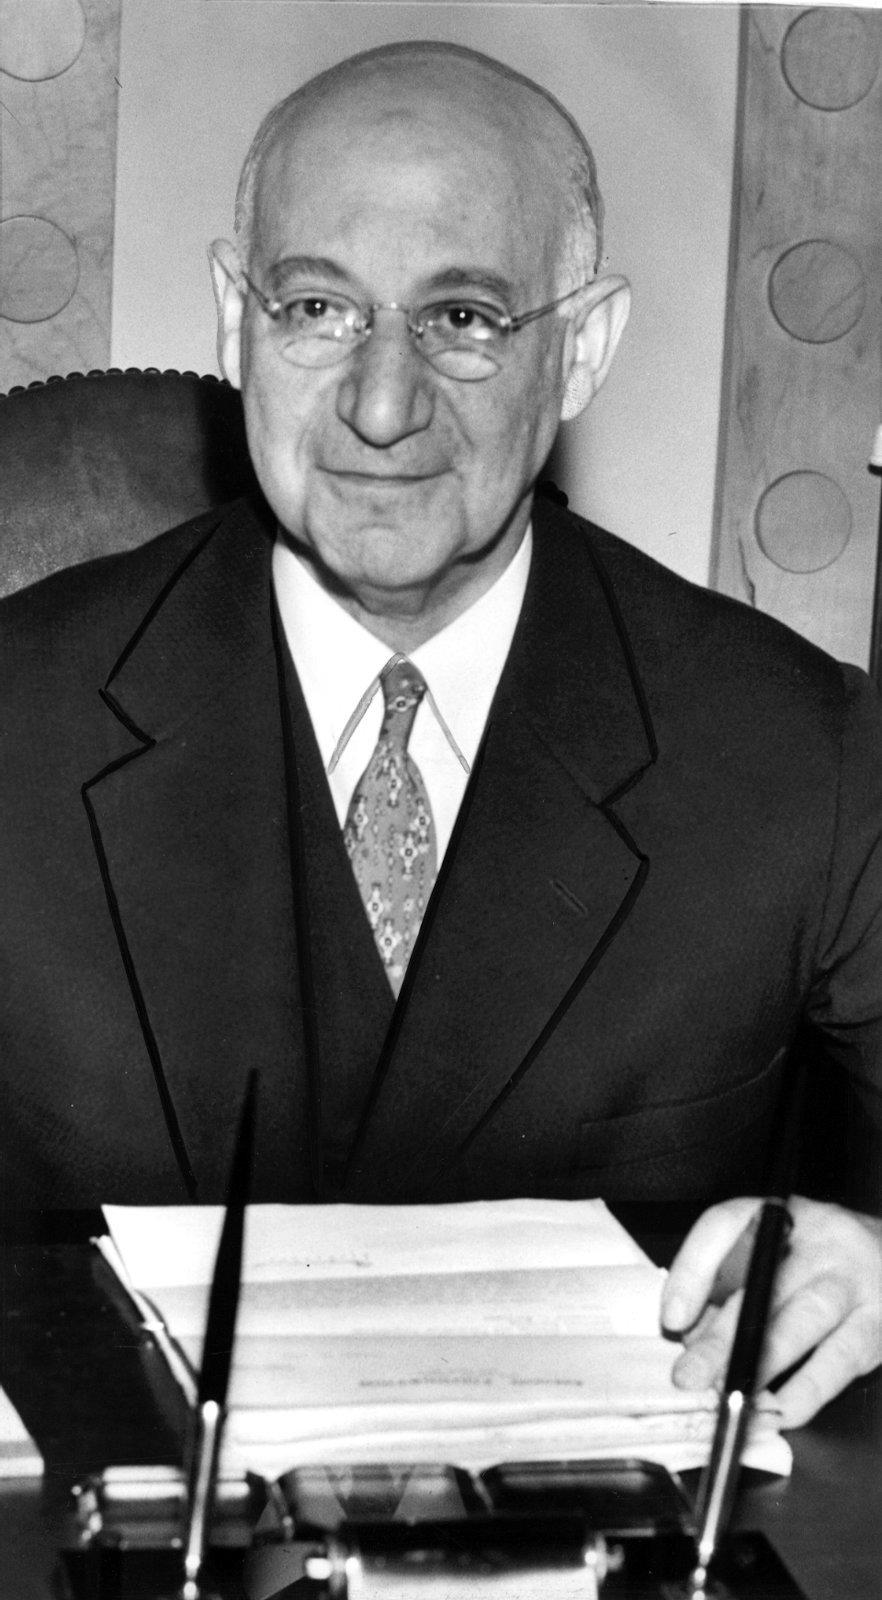 1957 photo--Jacob Blaustein, founder of Amoco. (file photo.)